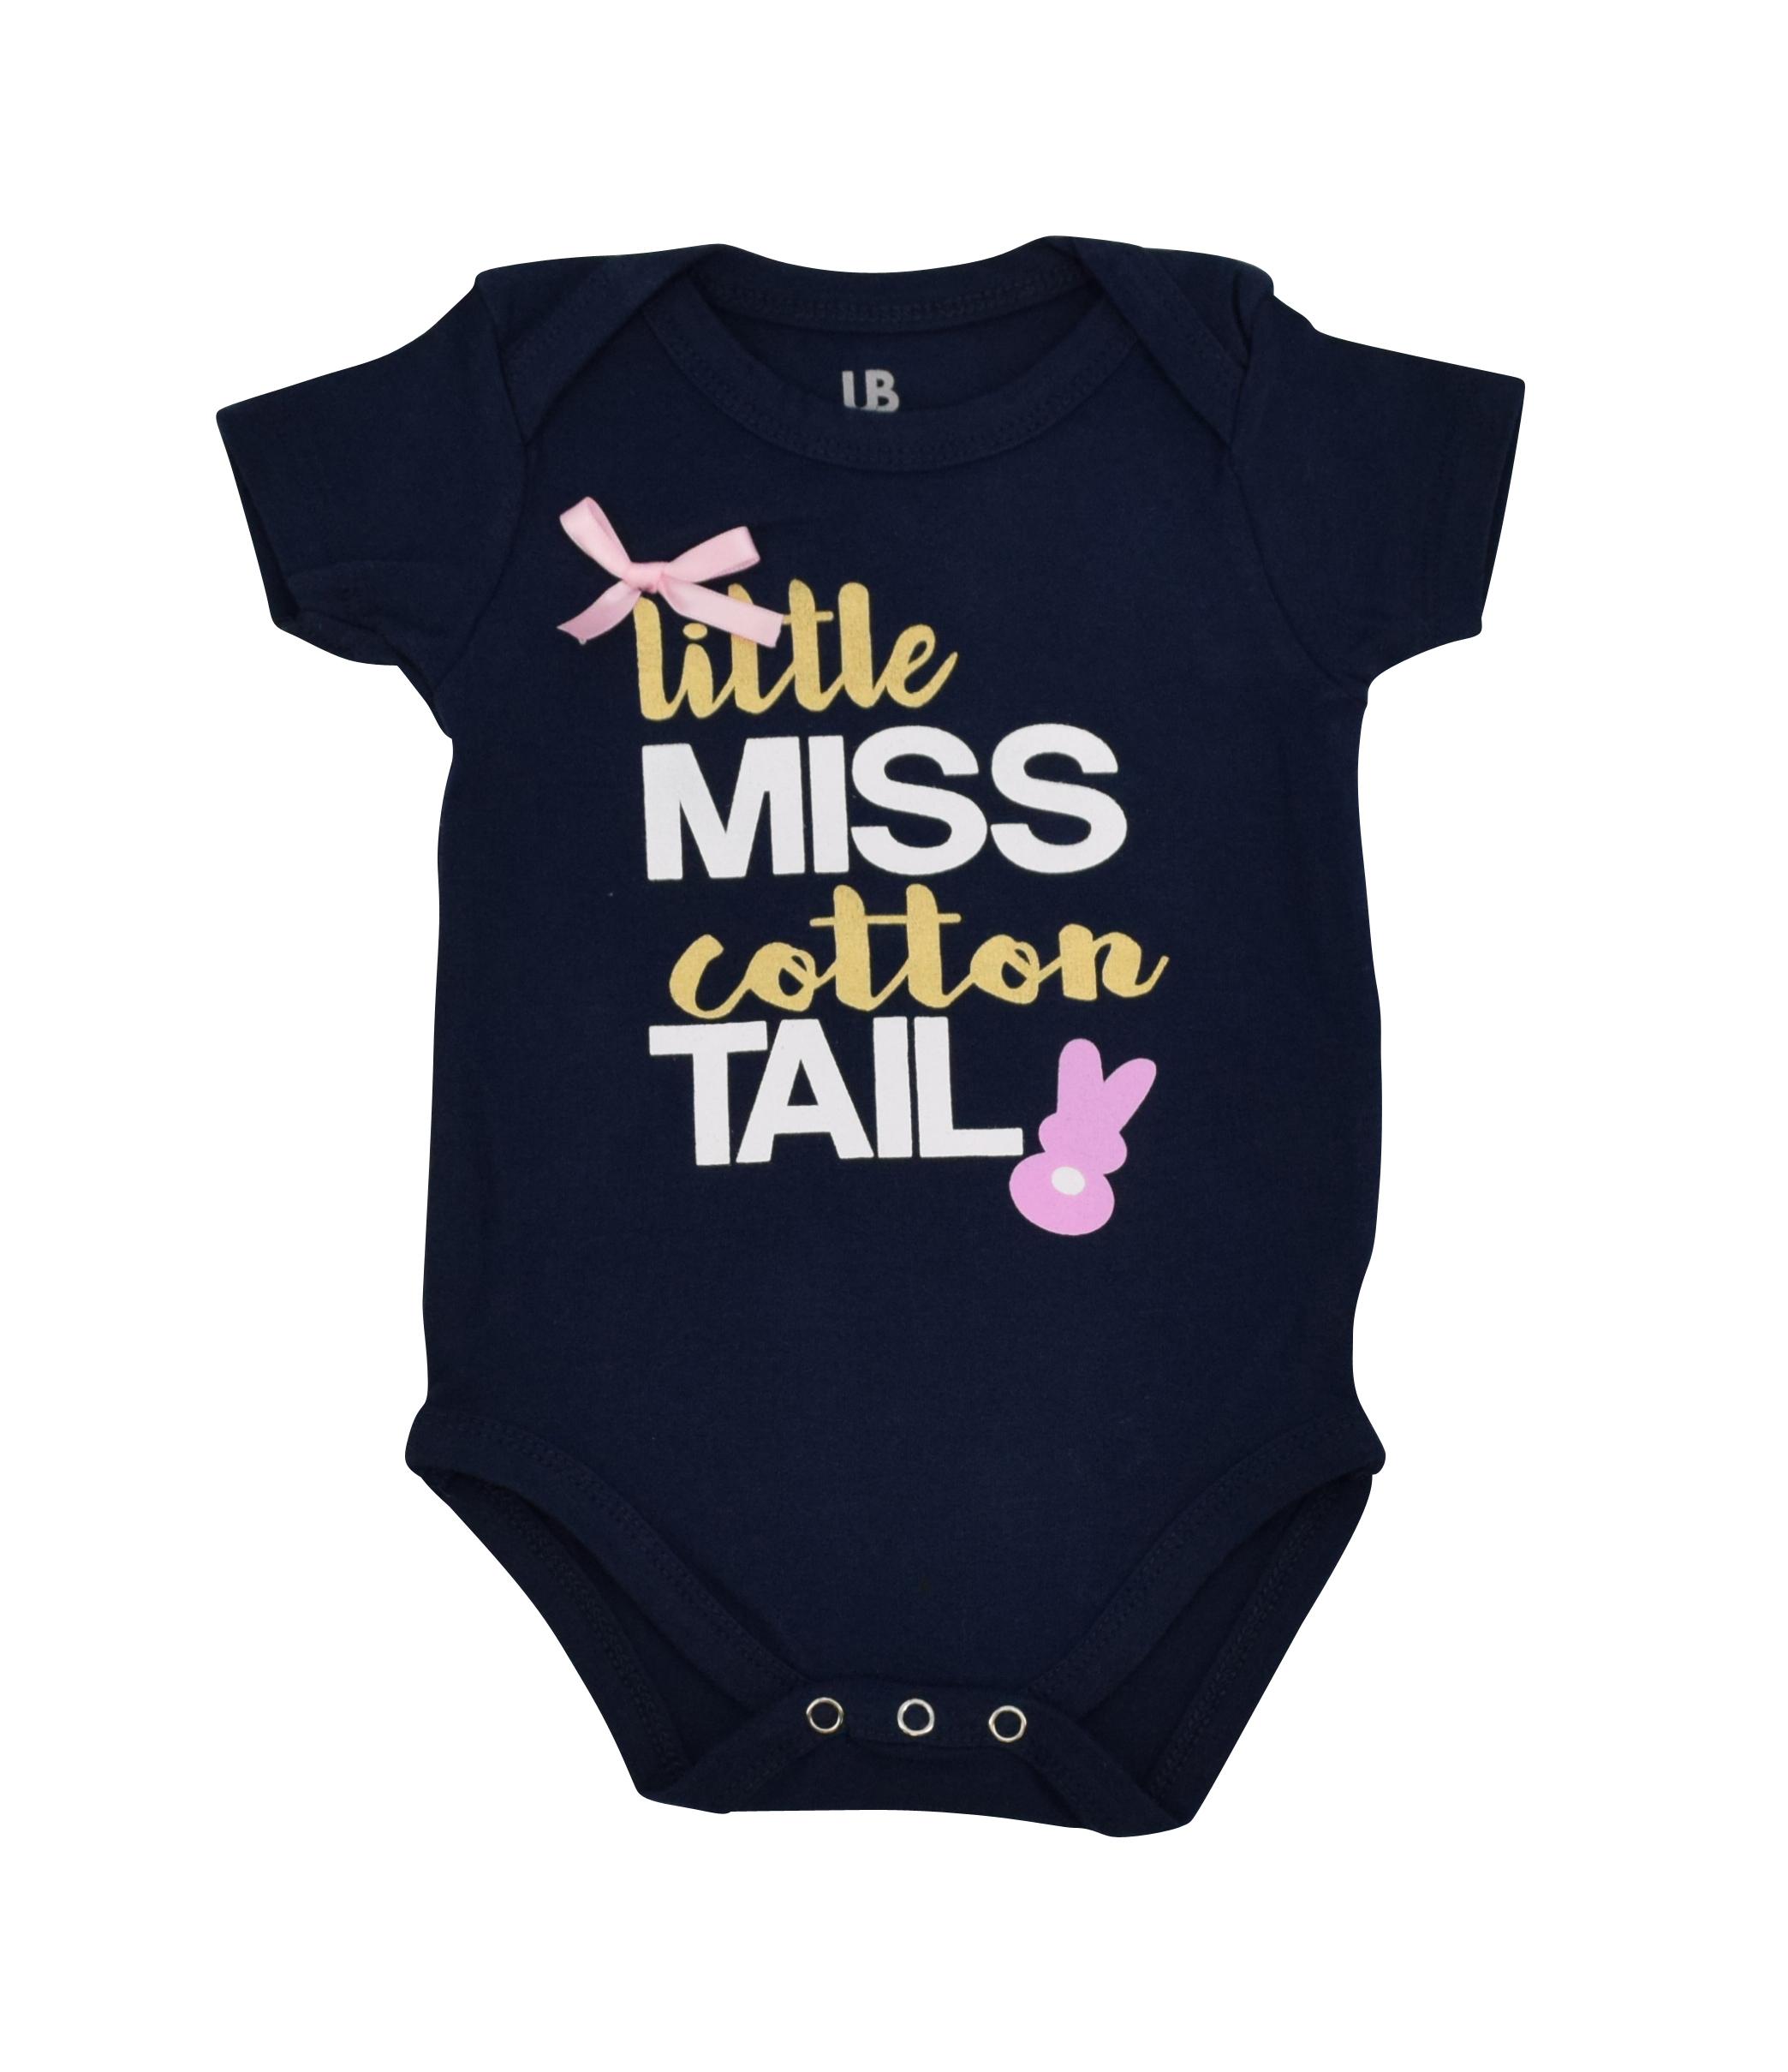 EASTER Onesie 12-18 months